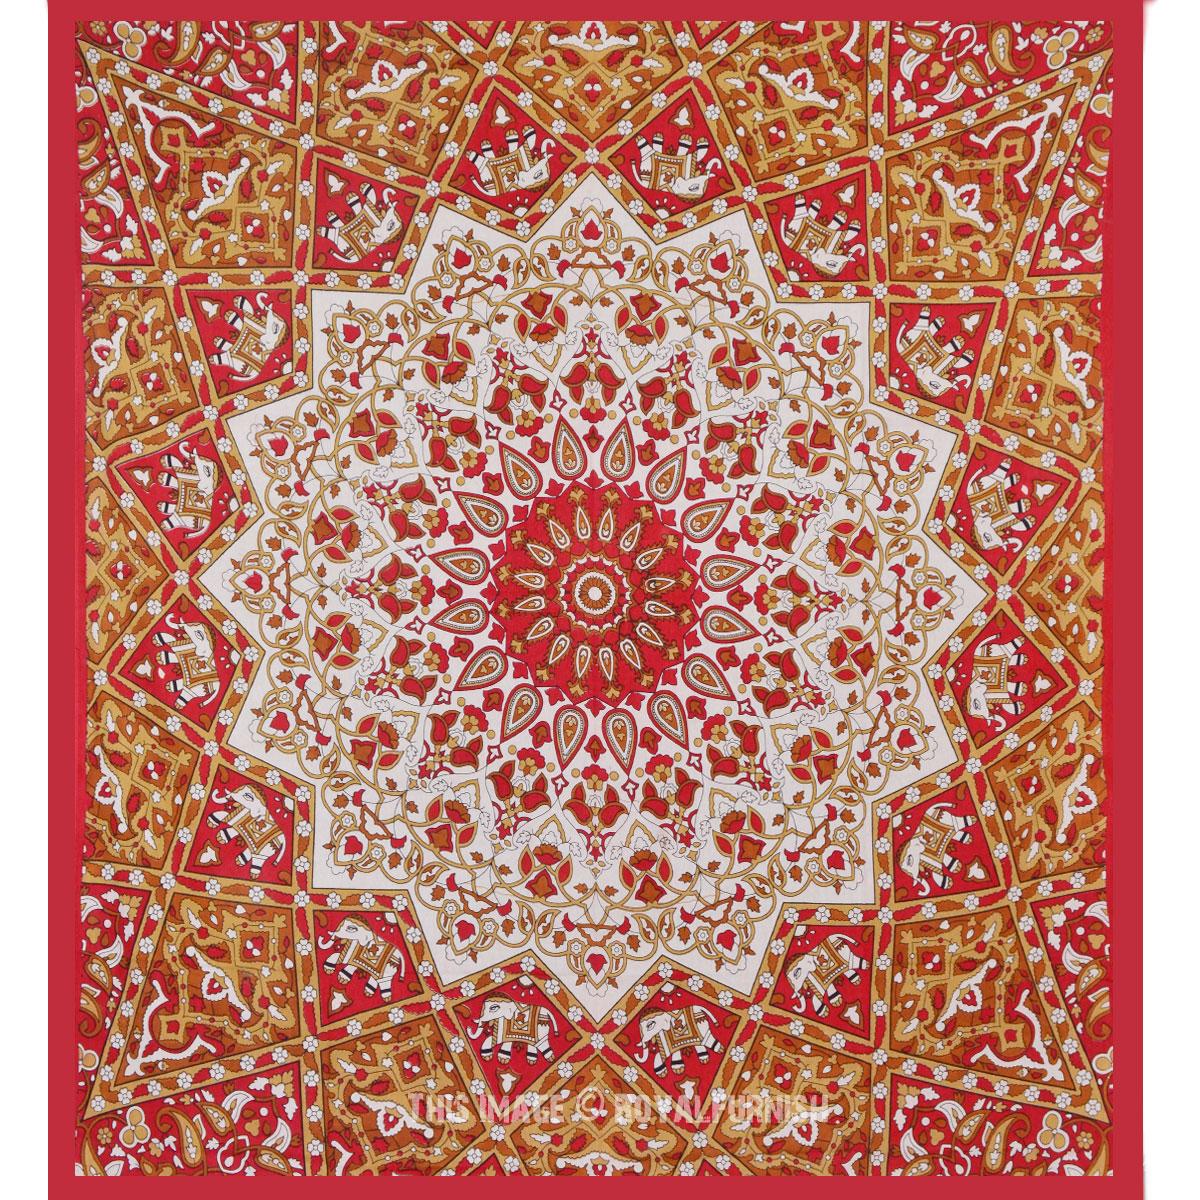 Red White Indian Mandala Star Dorm Decor Wall Tapestry Bedspread - RoyalFurnish.com